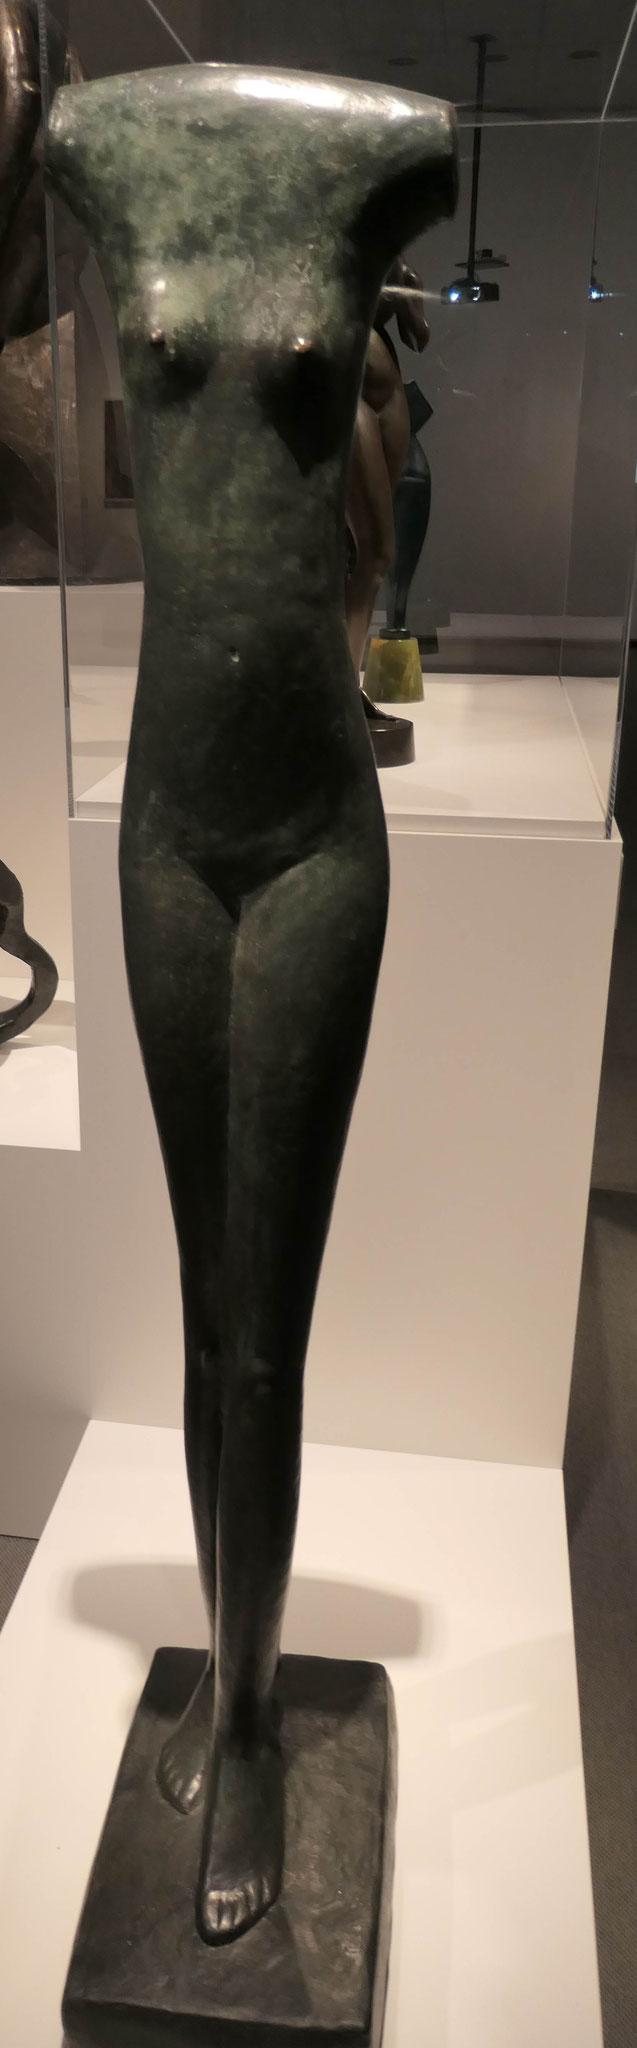 Alberto Giacometti, Schreitende Frau, 1932, Neue Nationalgalerie Berlin